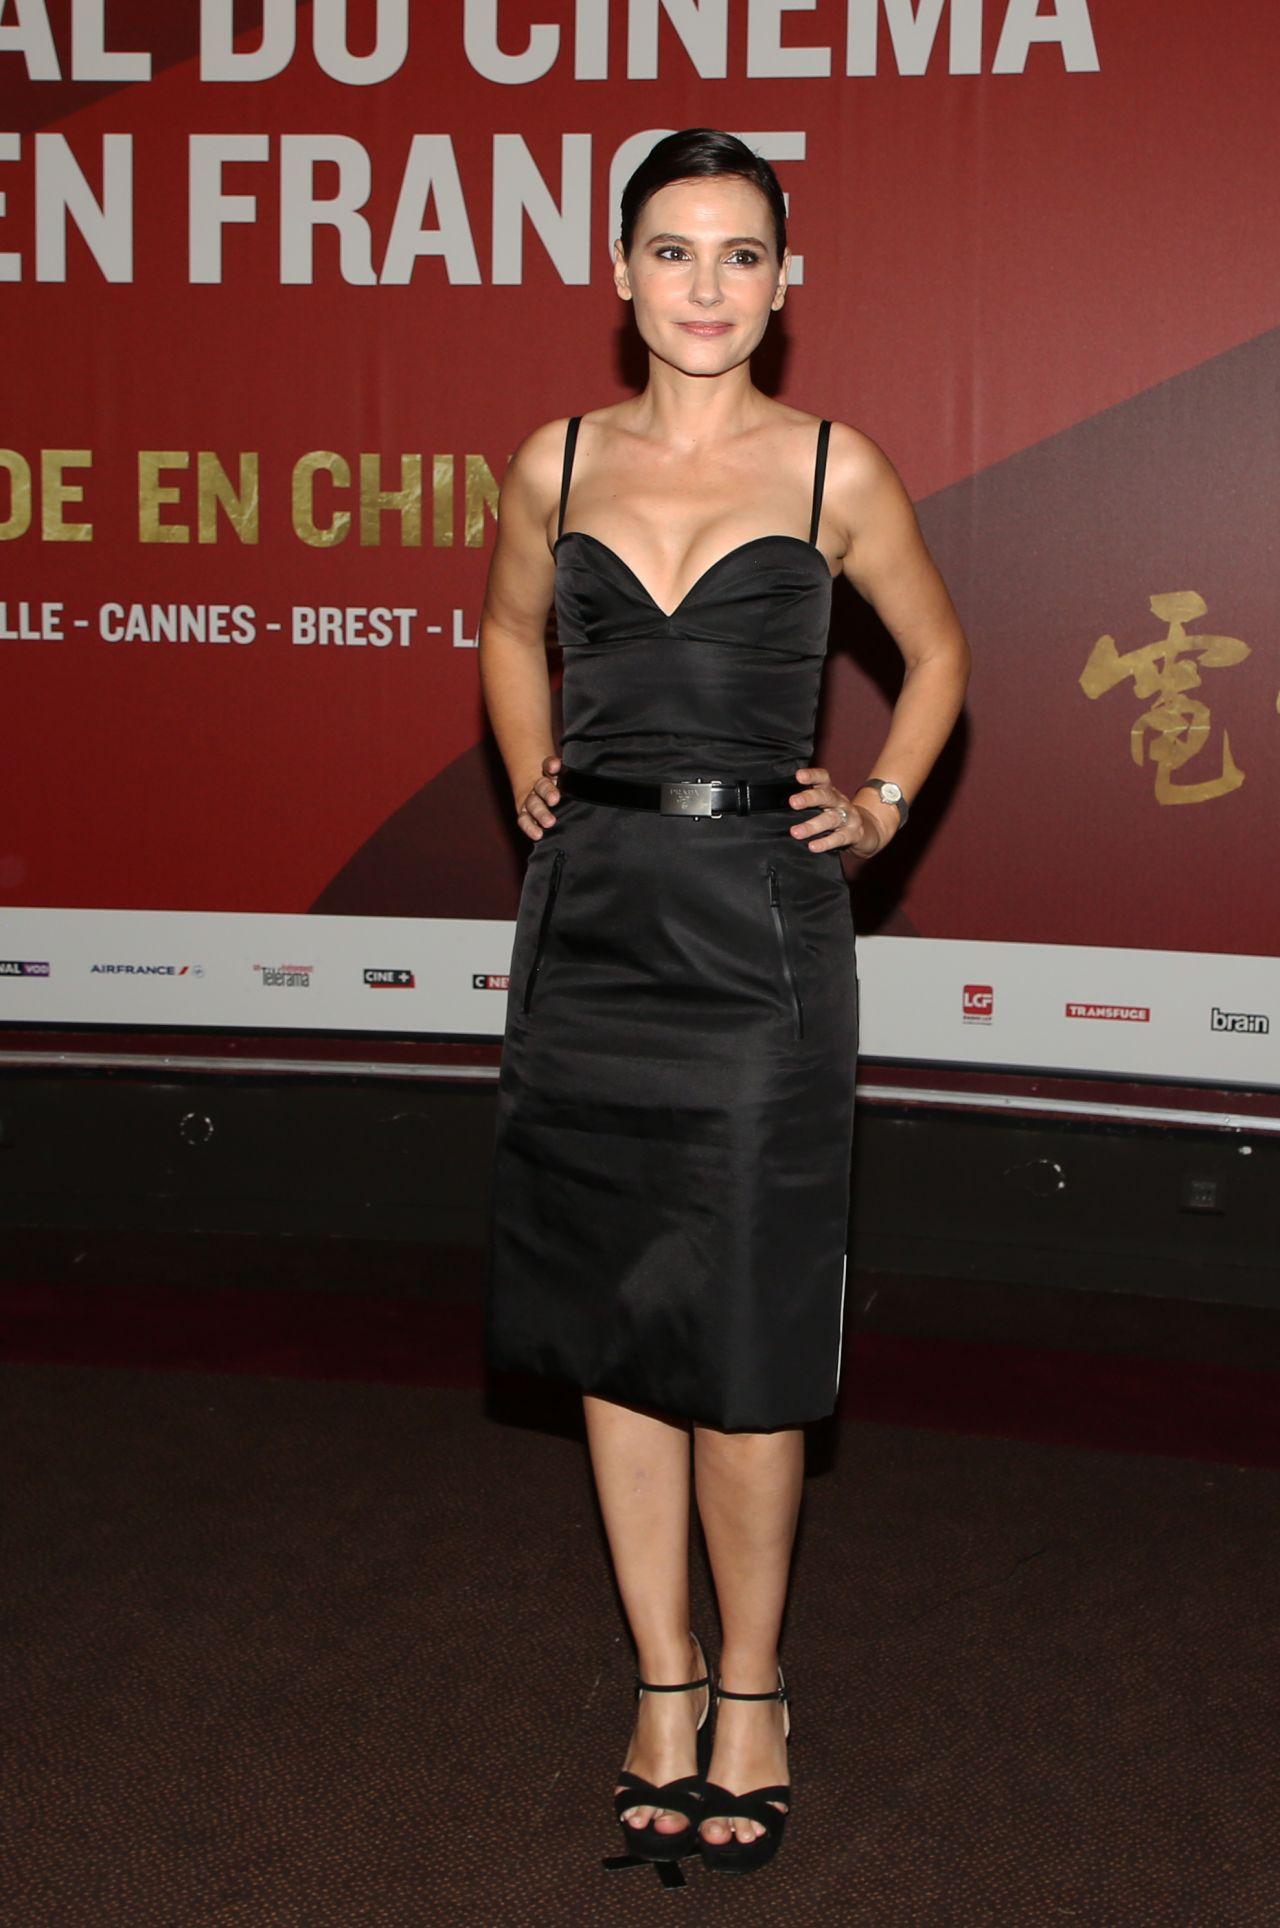 http://celebmafia.com/wp-content/uploads/2018/05/virginie-ledoyen-2018-chinese-film-festival-opening-ceremony-in-paris-6.jpg